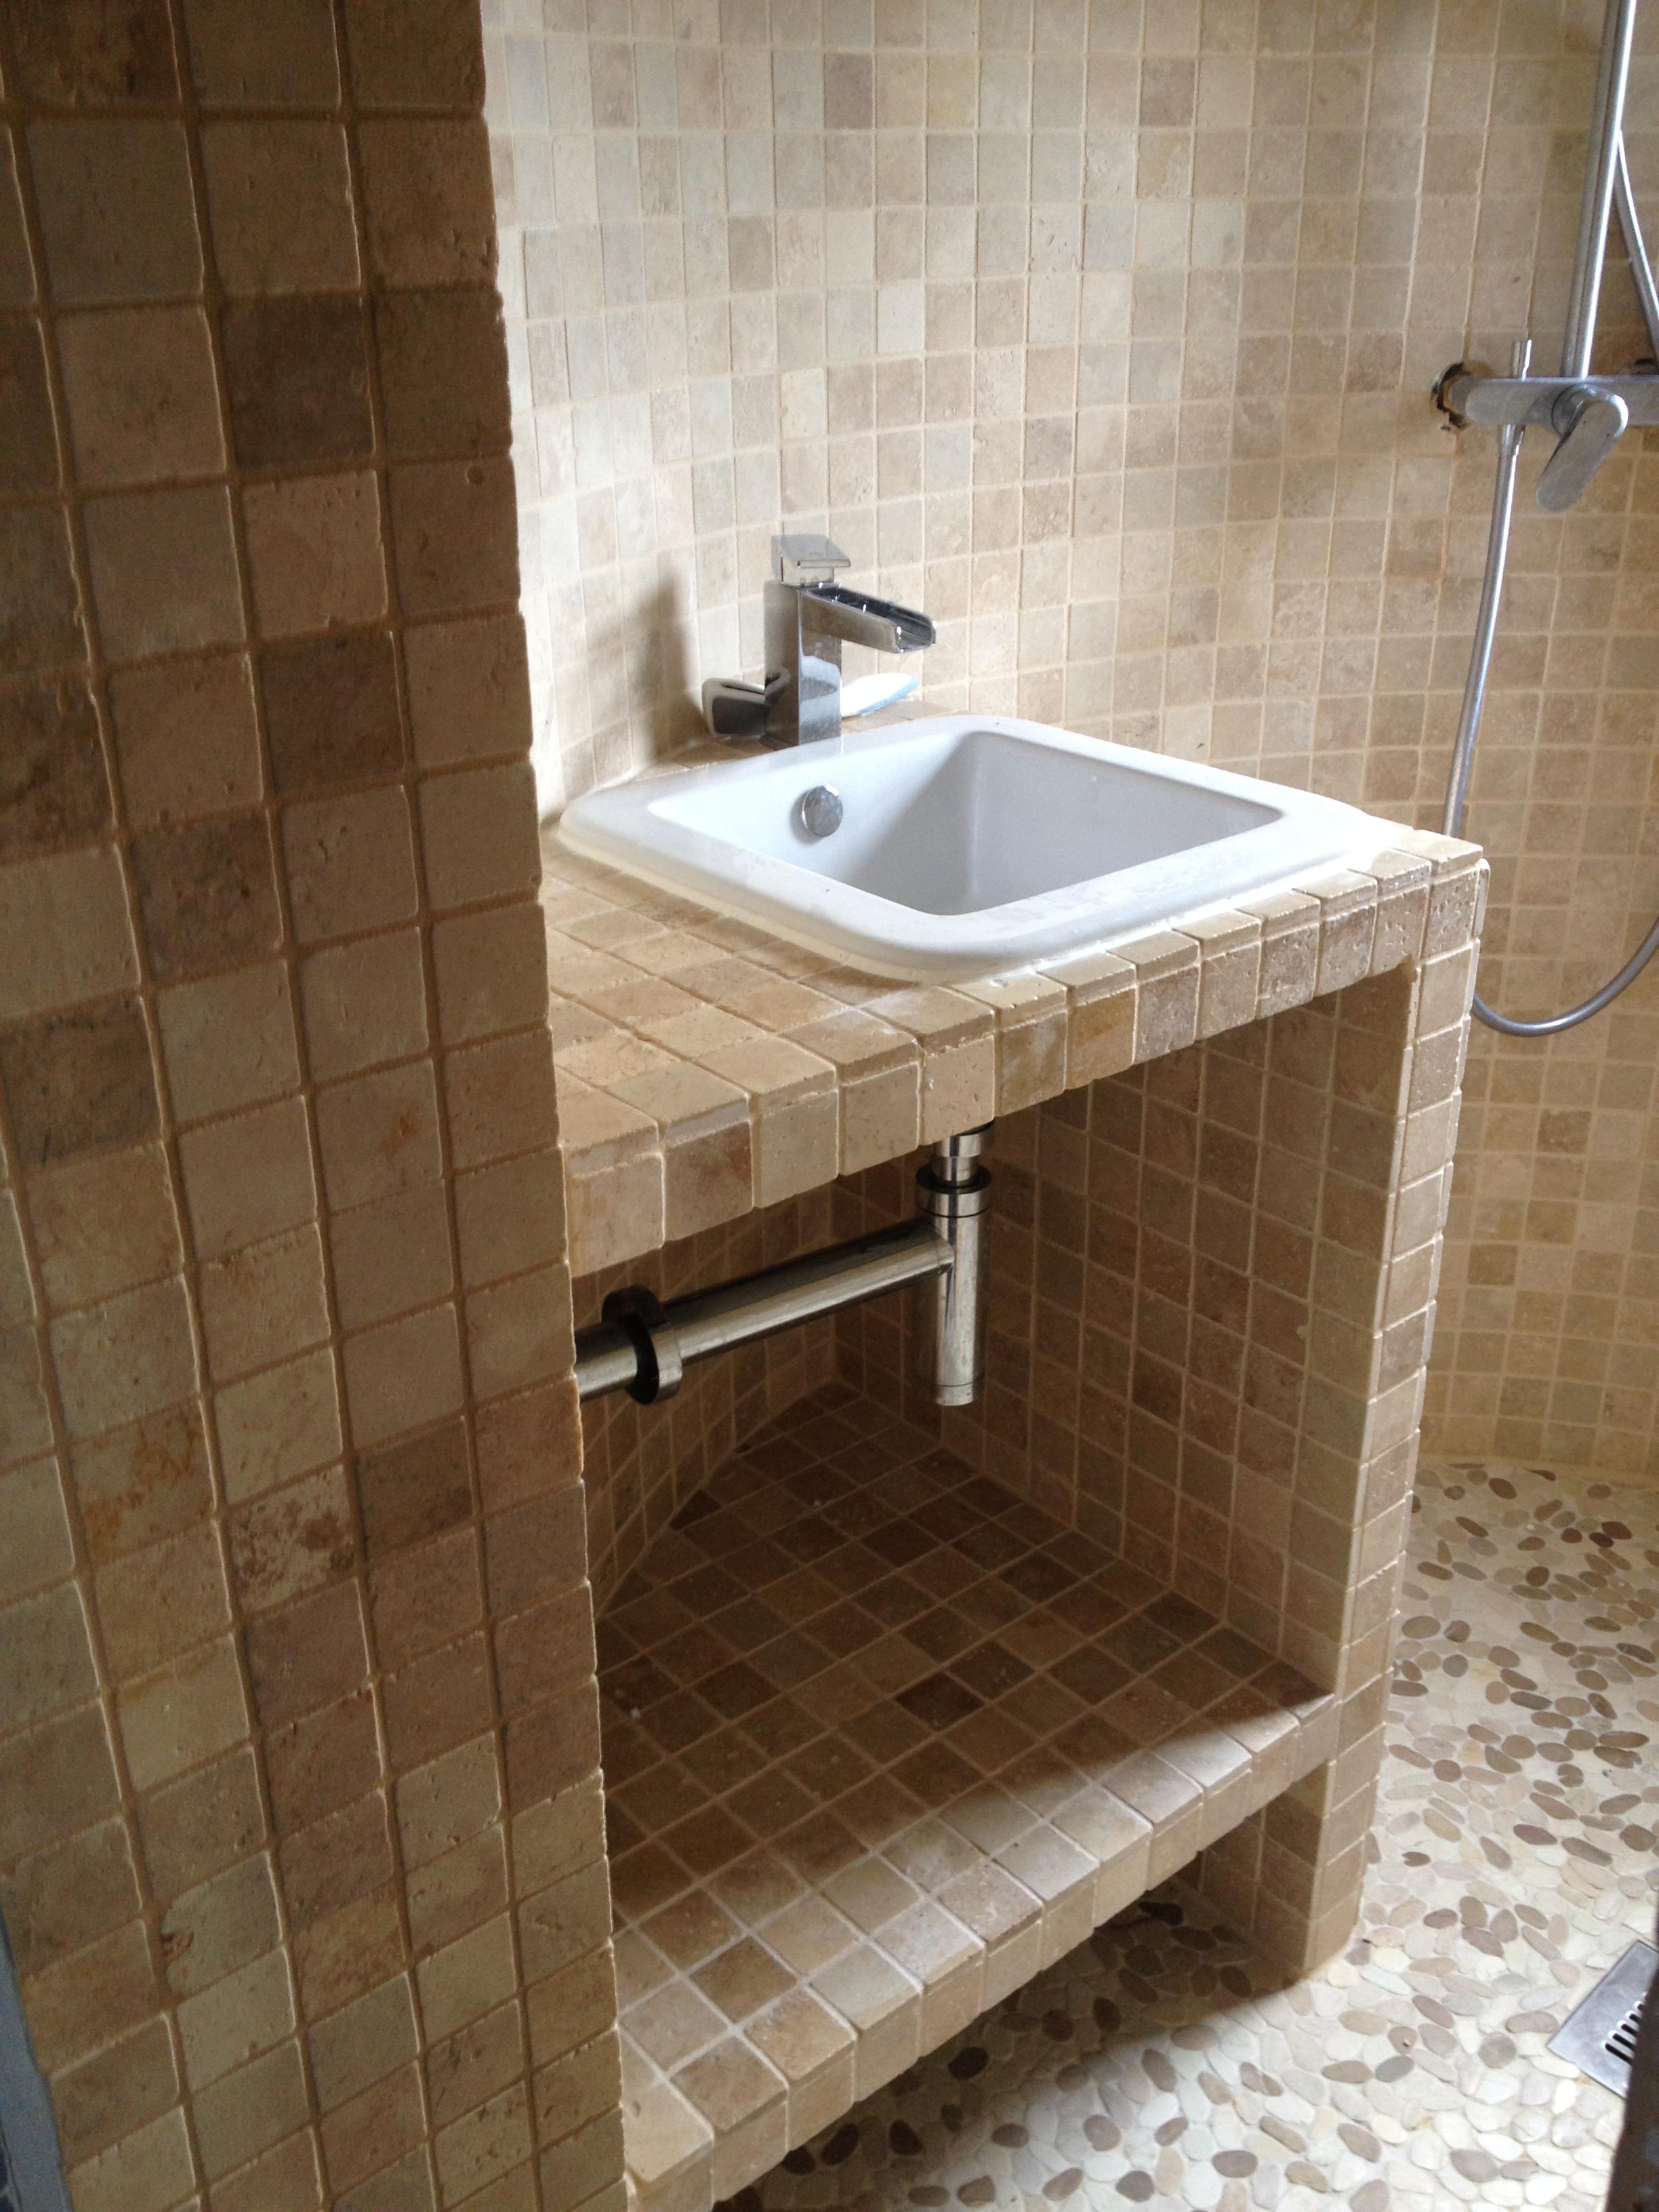 Super Salles de bains reflet carrelage - reflet carrelage IO-14